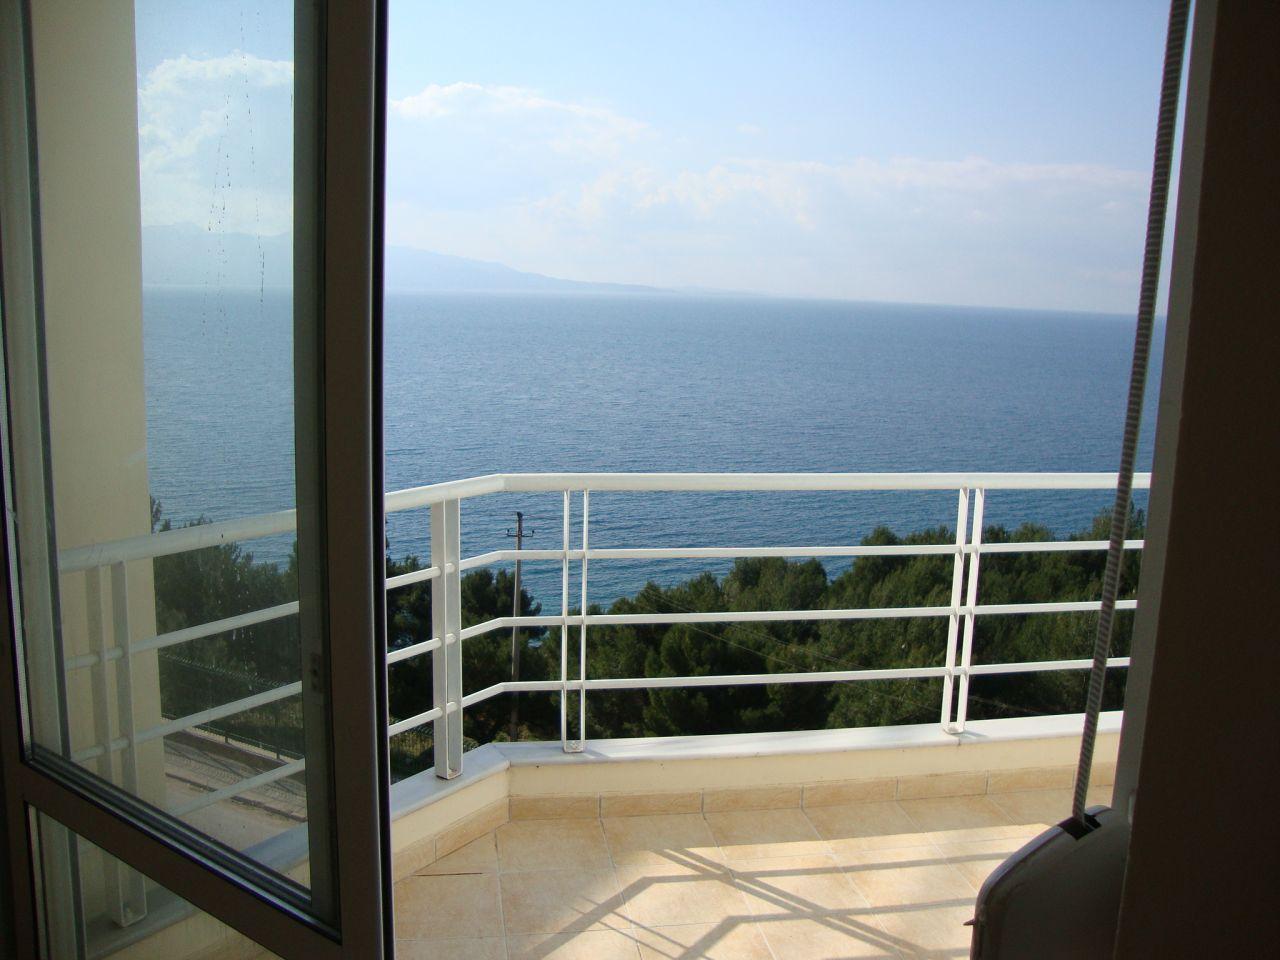 Apartment for sale in Saranda. Seaview apartments for sale in Albania.